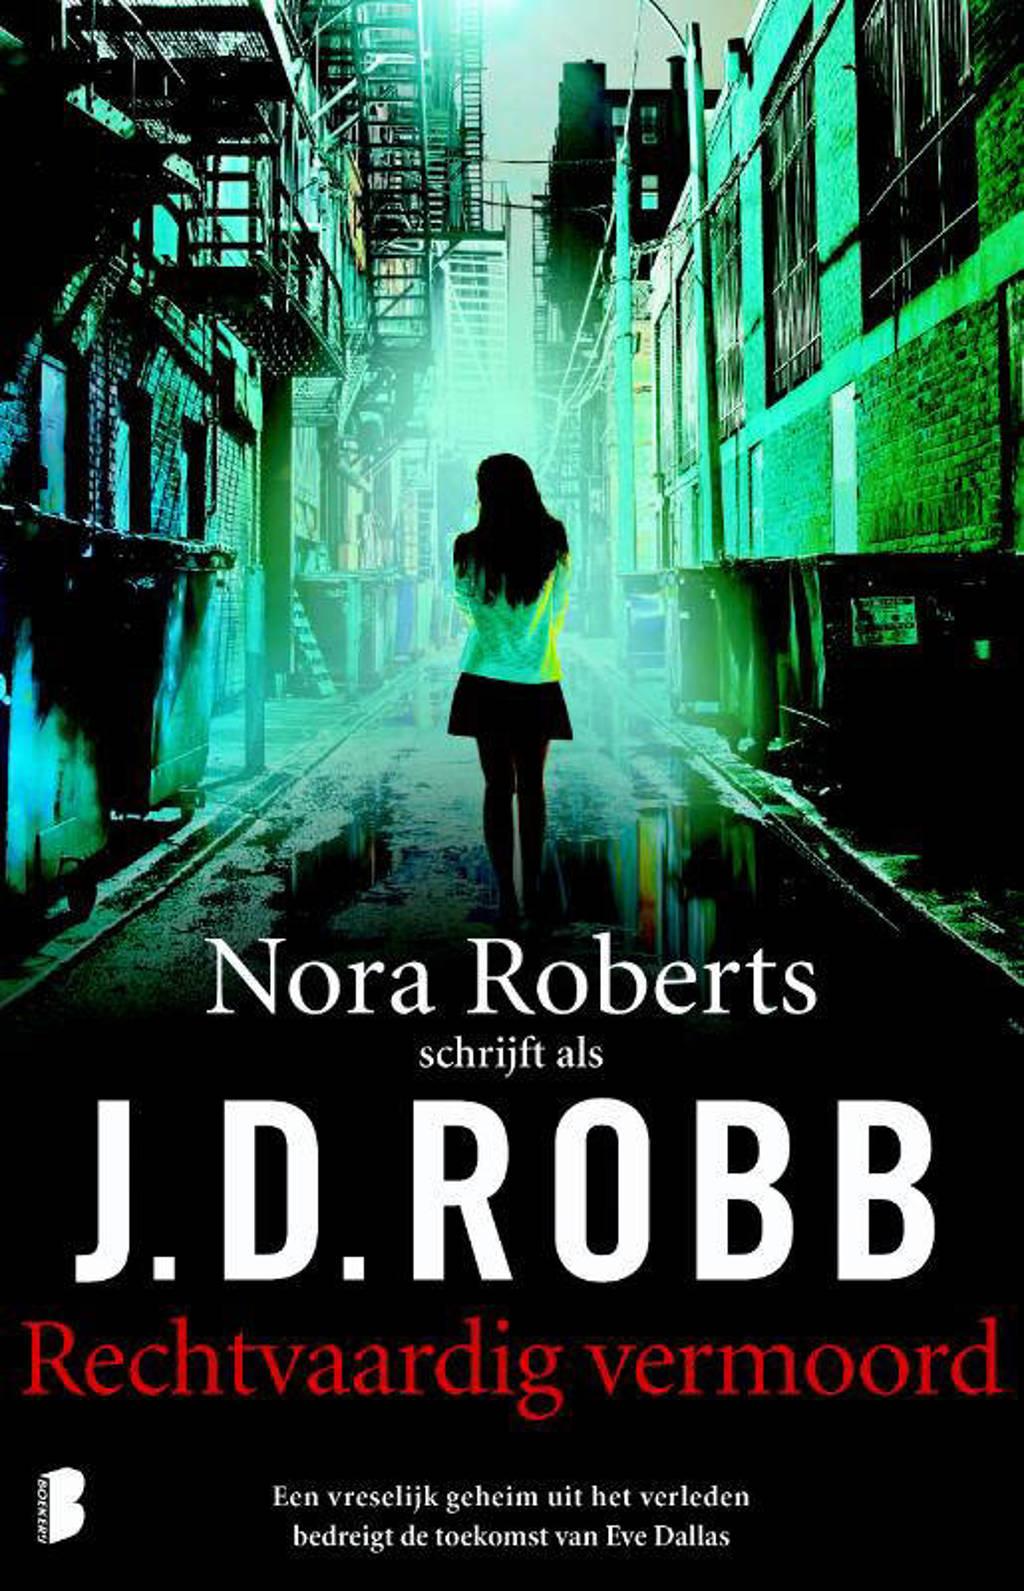 Eve Dallas: Rechtvaardig vermoord - J.D. Robb